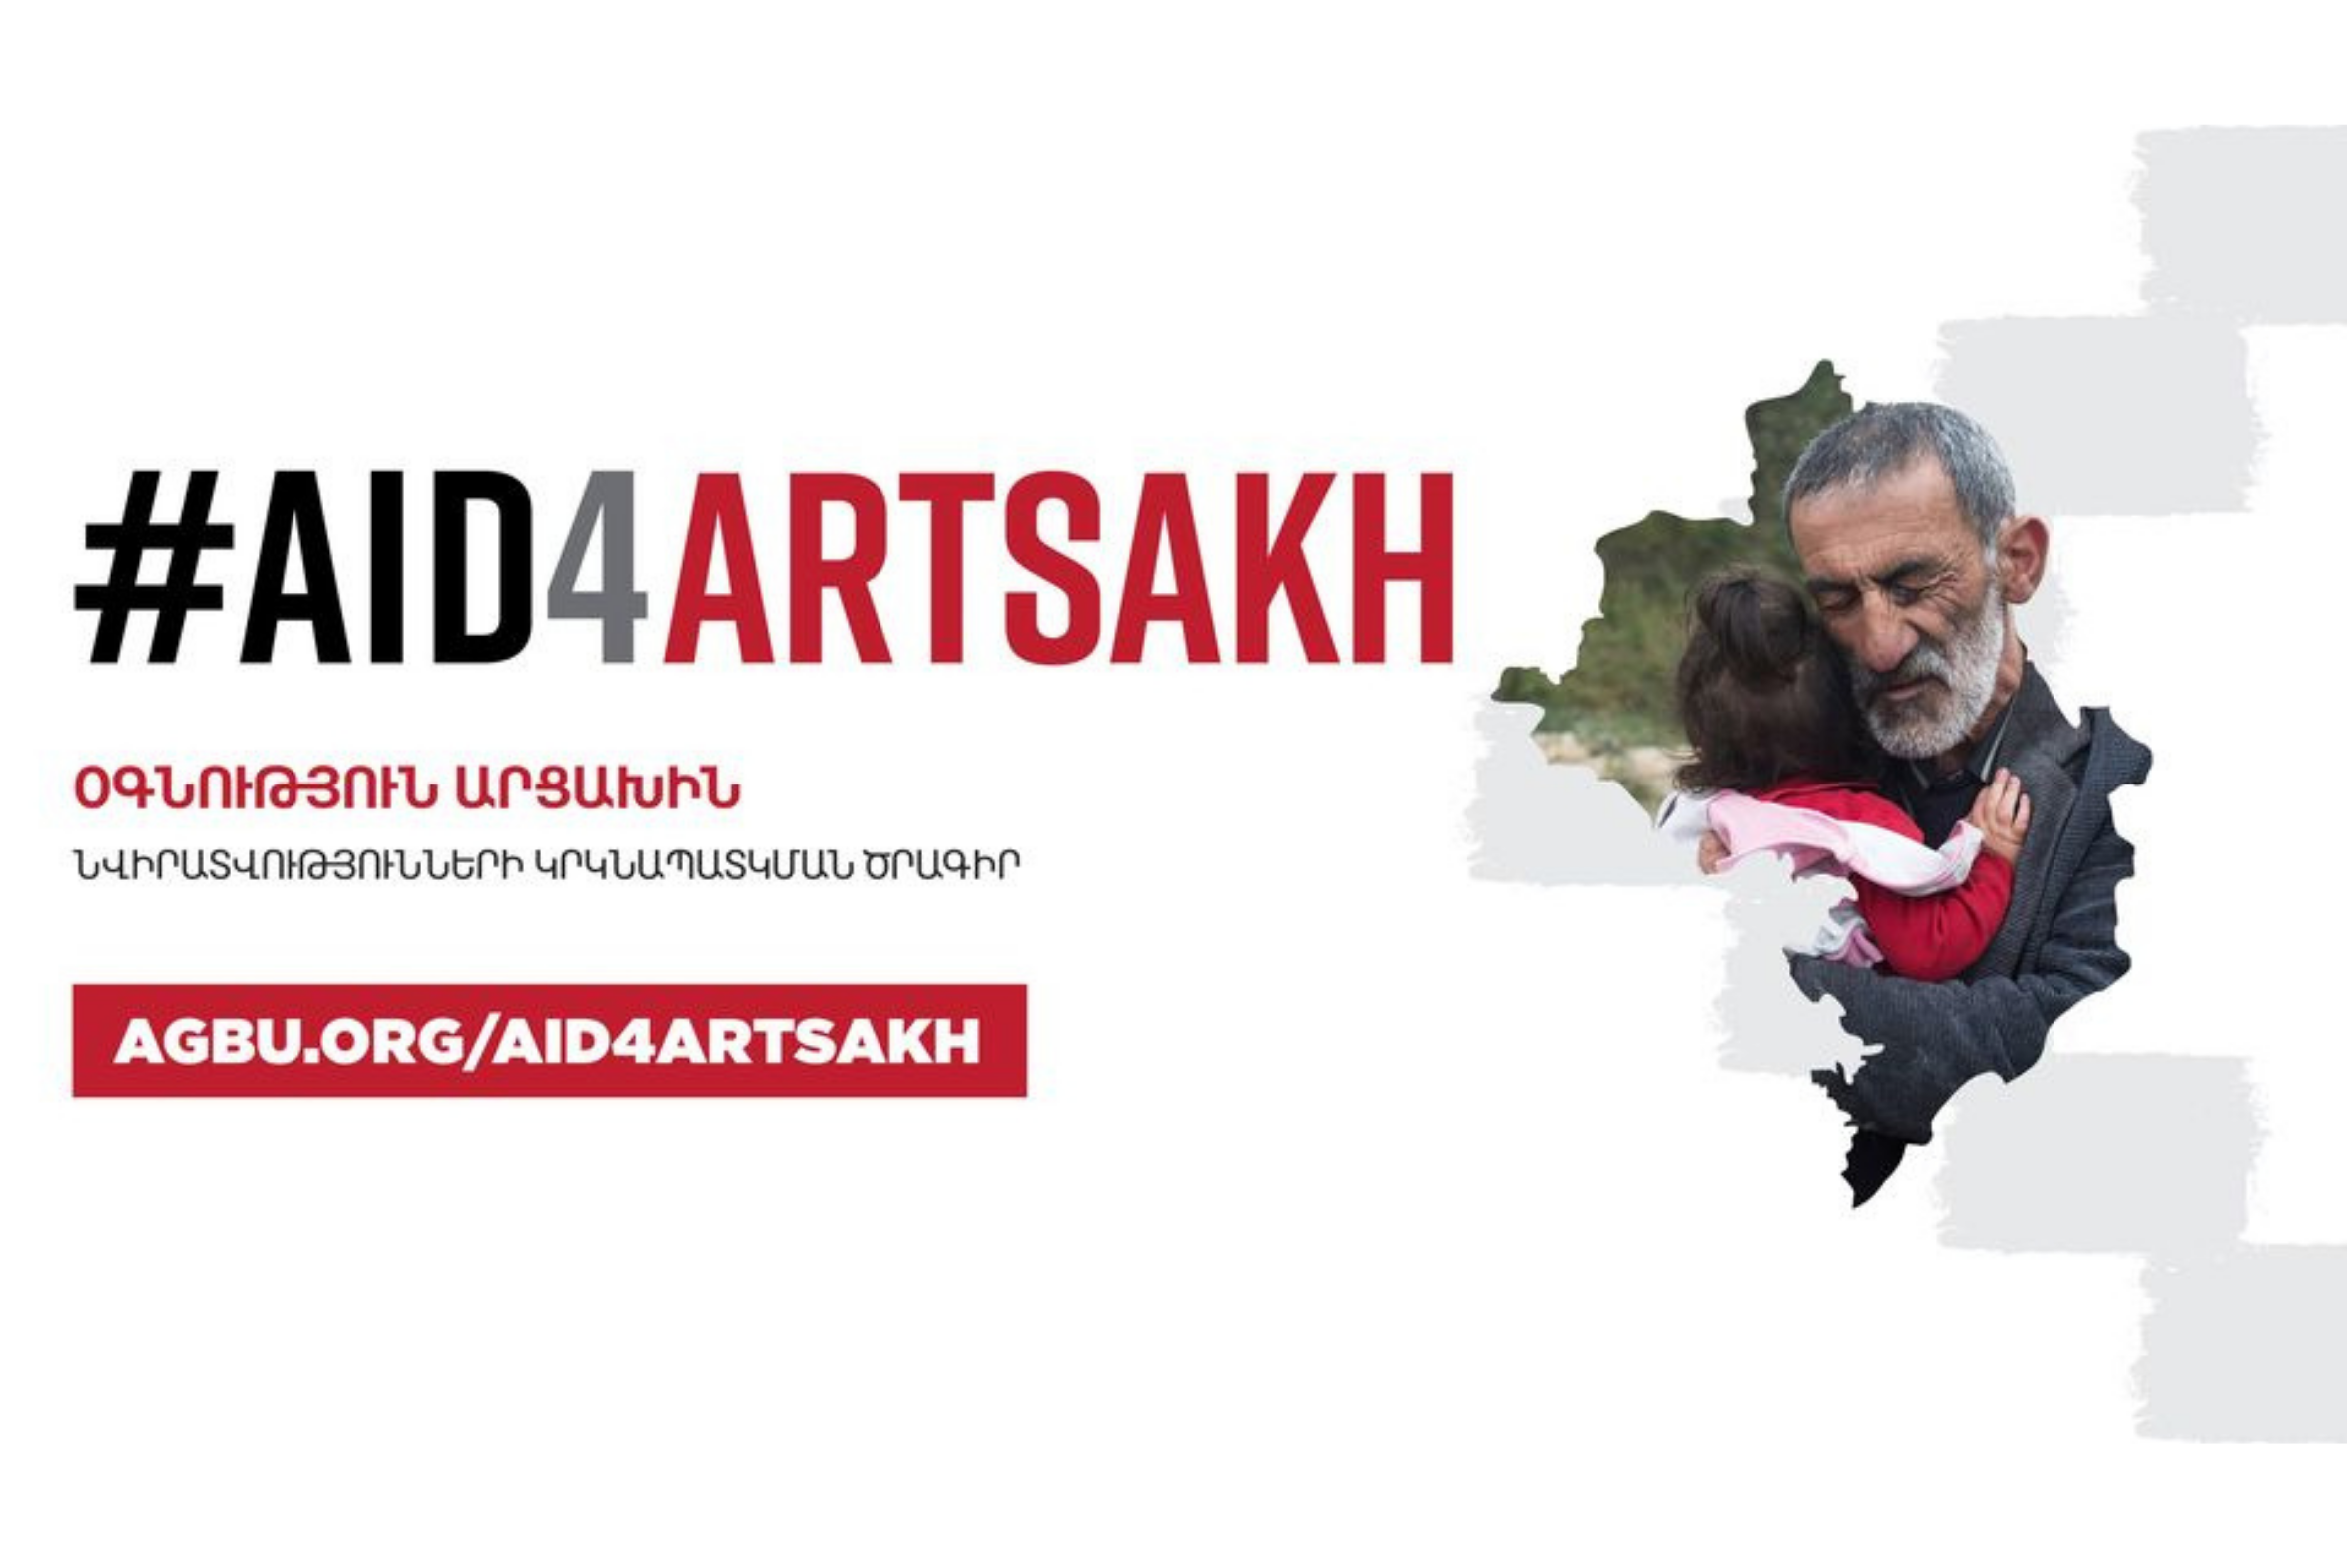 AID4ARTSAKH